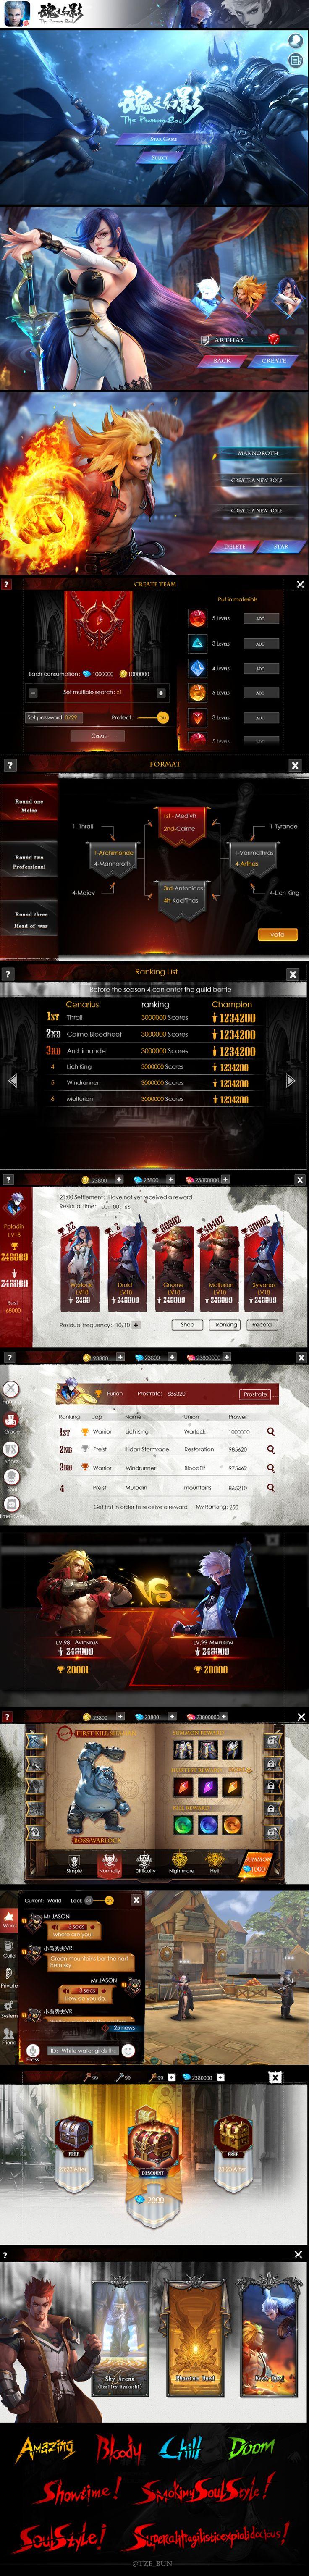 原创作品:《The Phantom Soul》(魂之幻影) NetEase Inc.